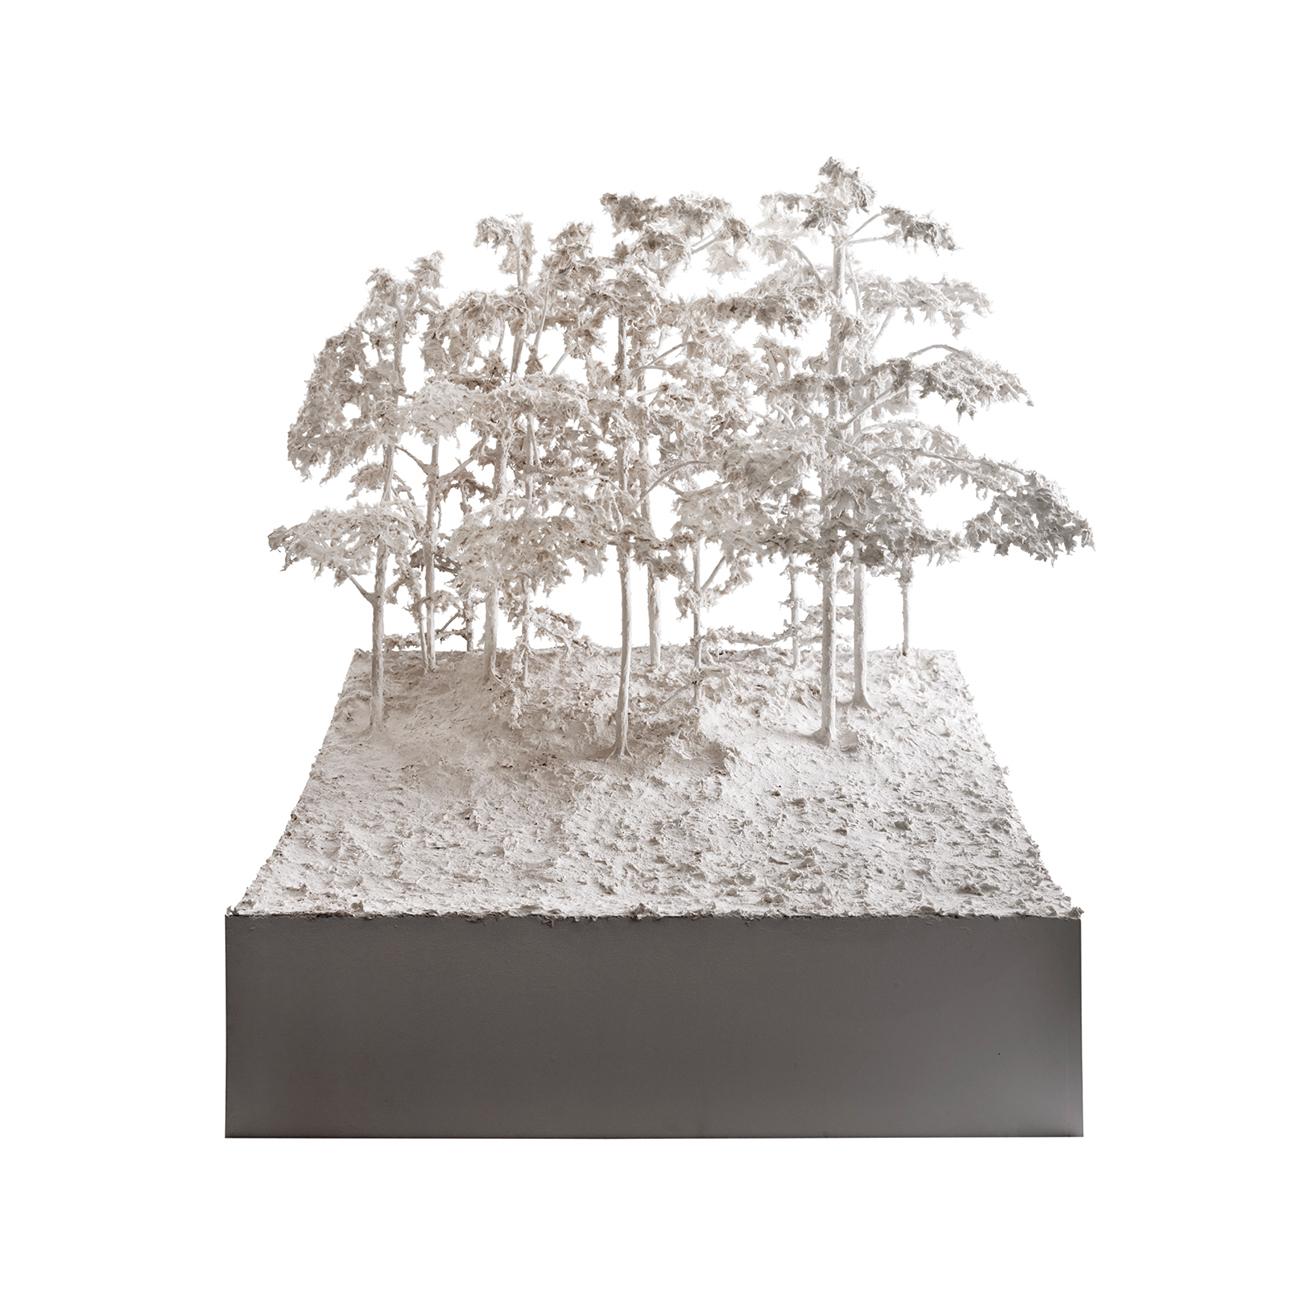 Tomas Gilljam  Dead Calm, Rude Nature  2008 Papier-Maché 183 x 76 x 86 cm inc. glass cube and plinth